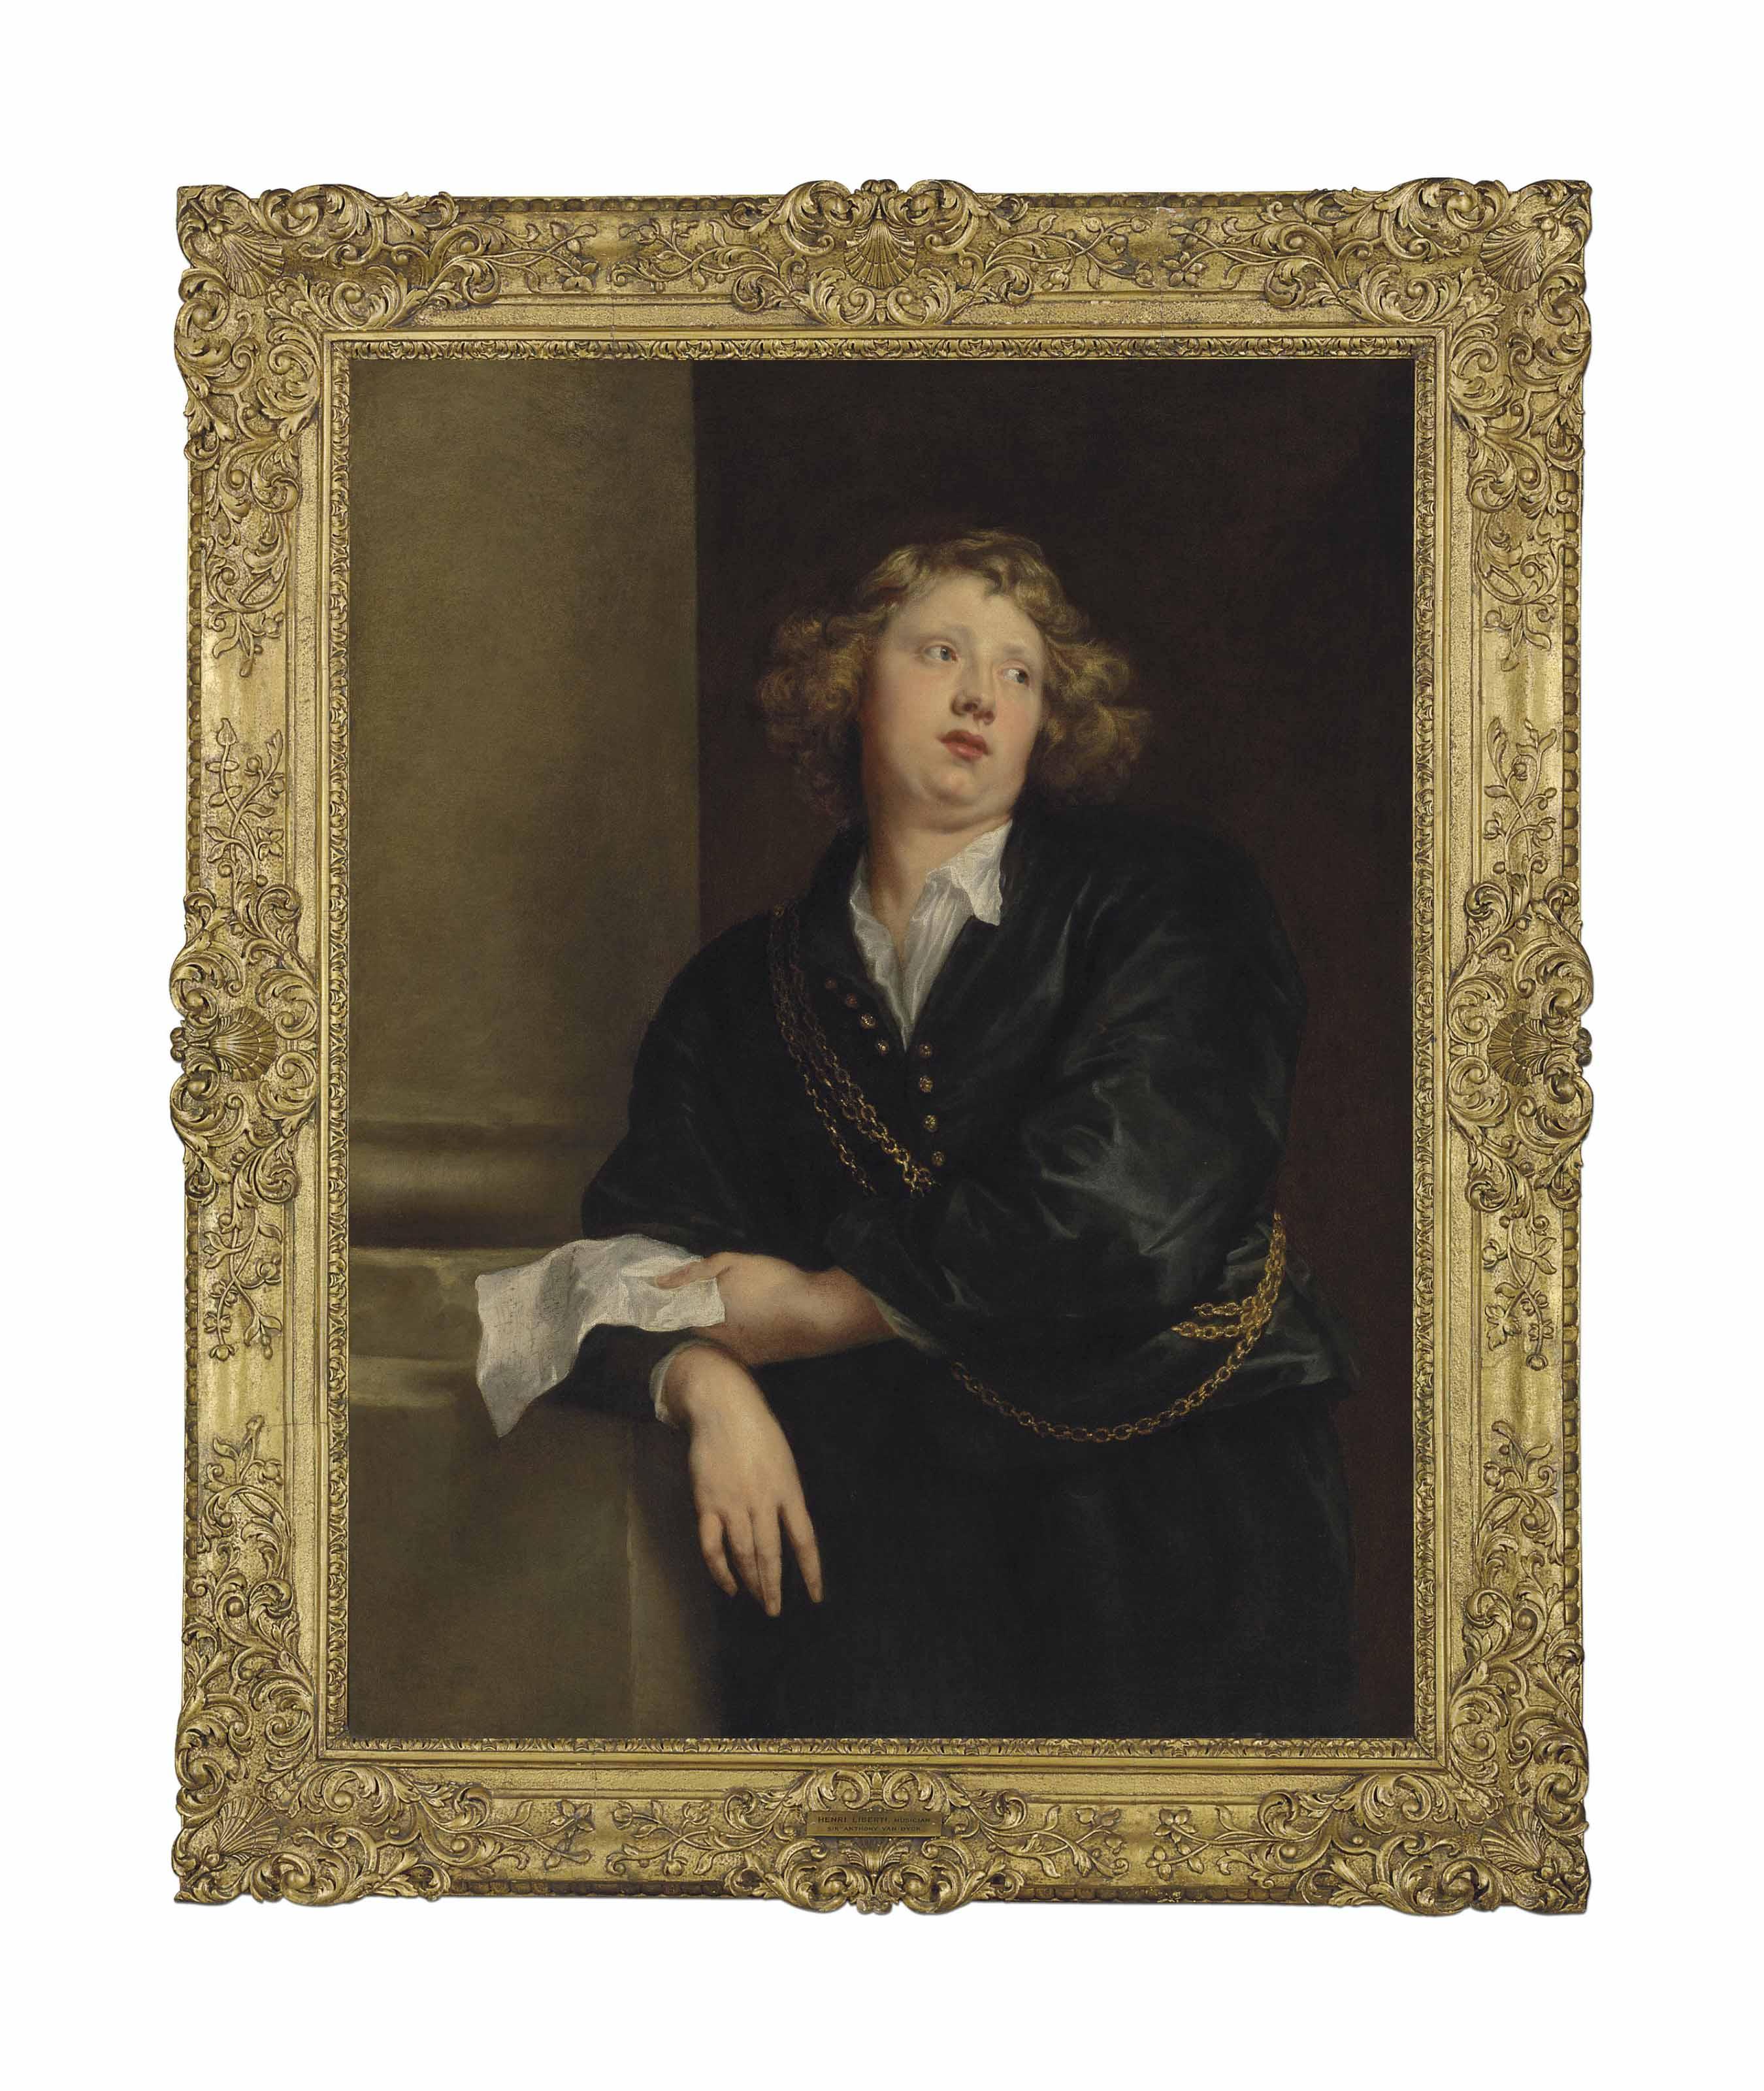 Audio: Sir Anthony van Dyck, Portrait of Hendrick Liberti (c. 1600-1669)